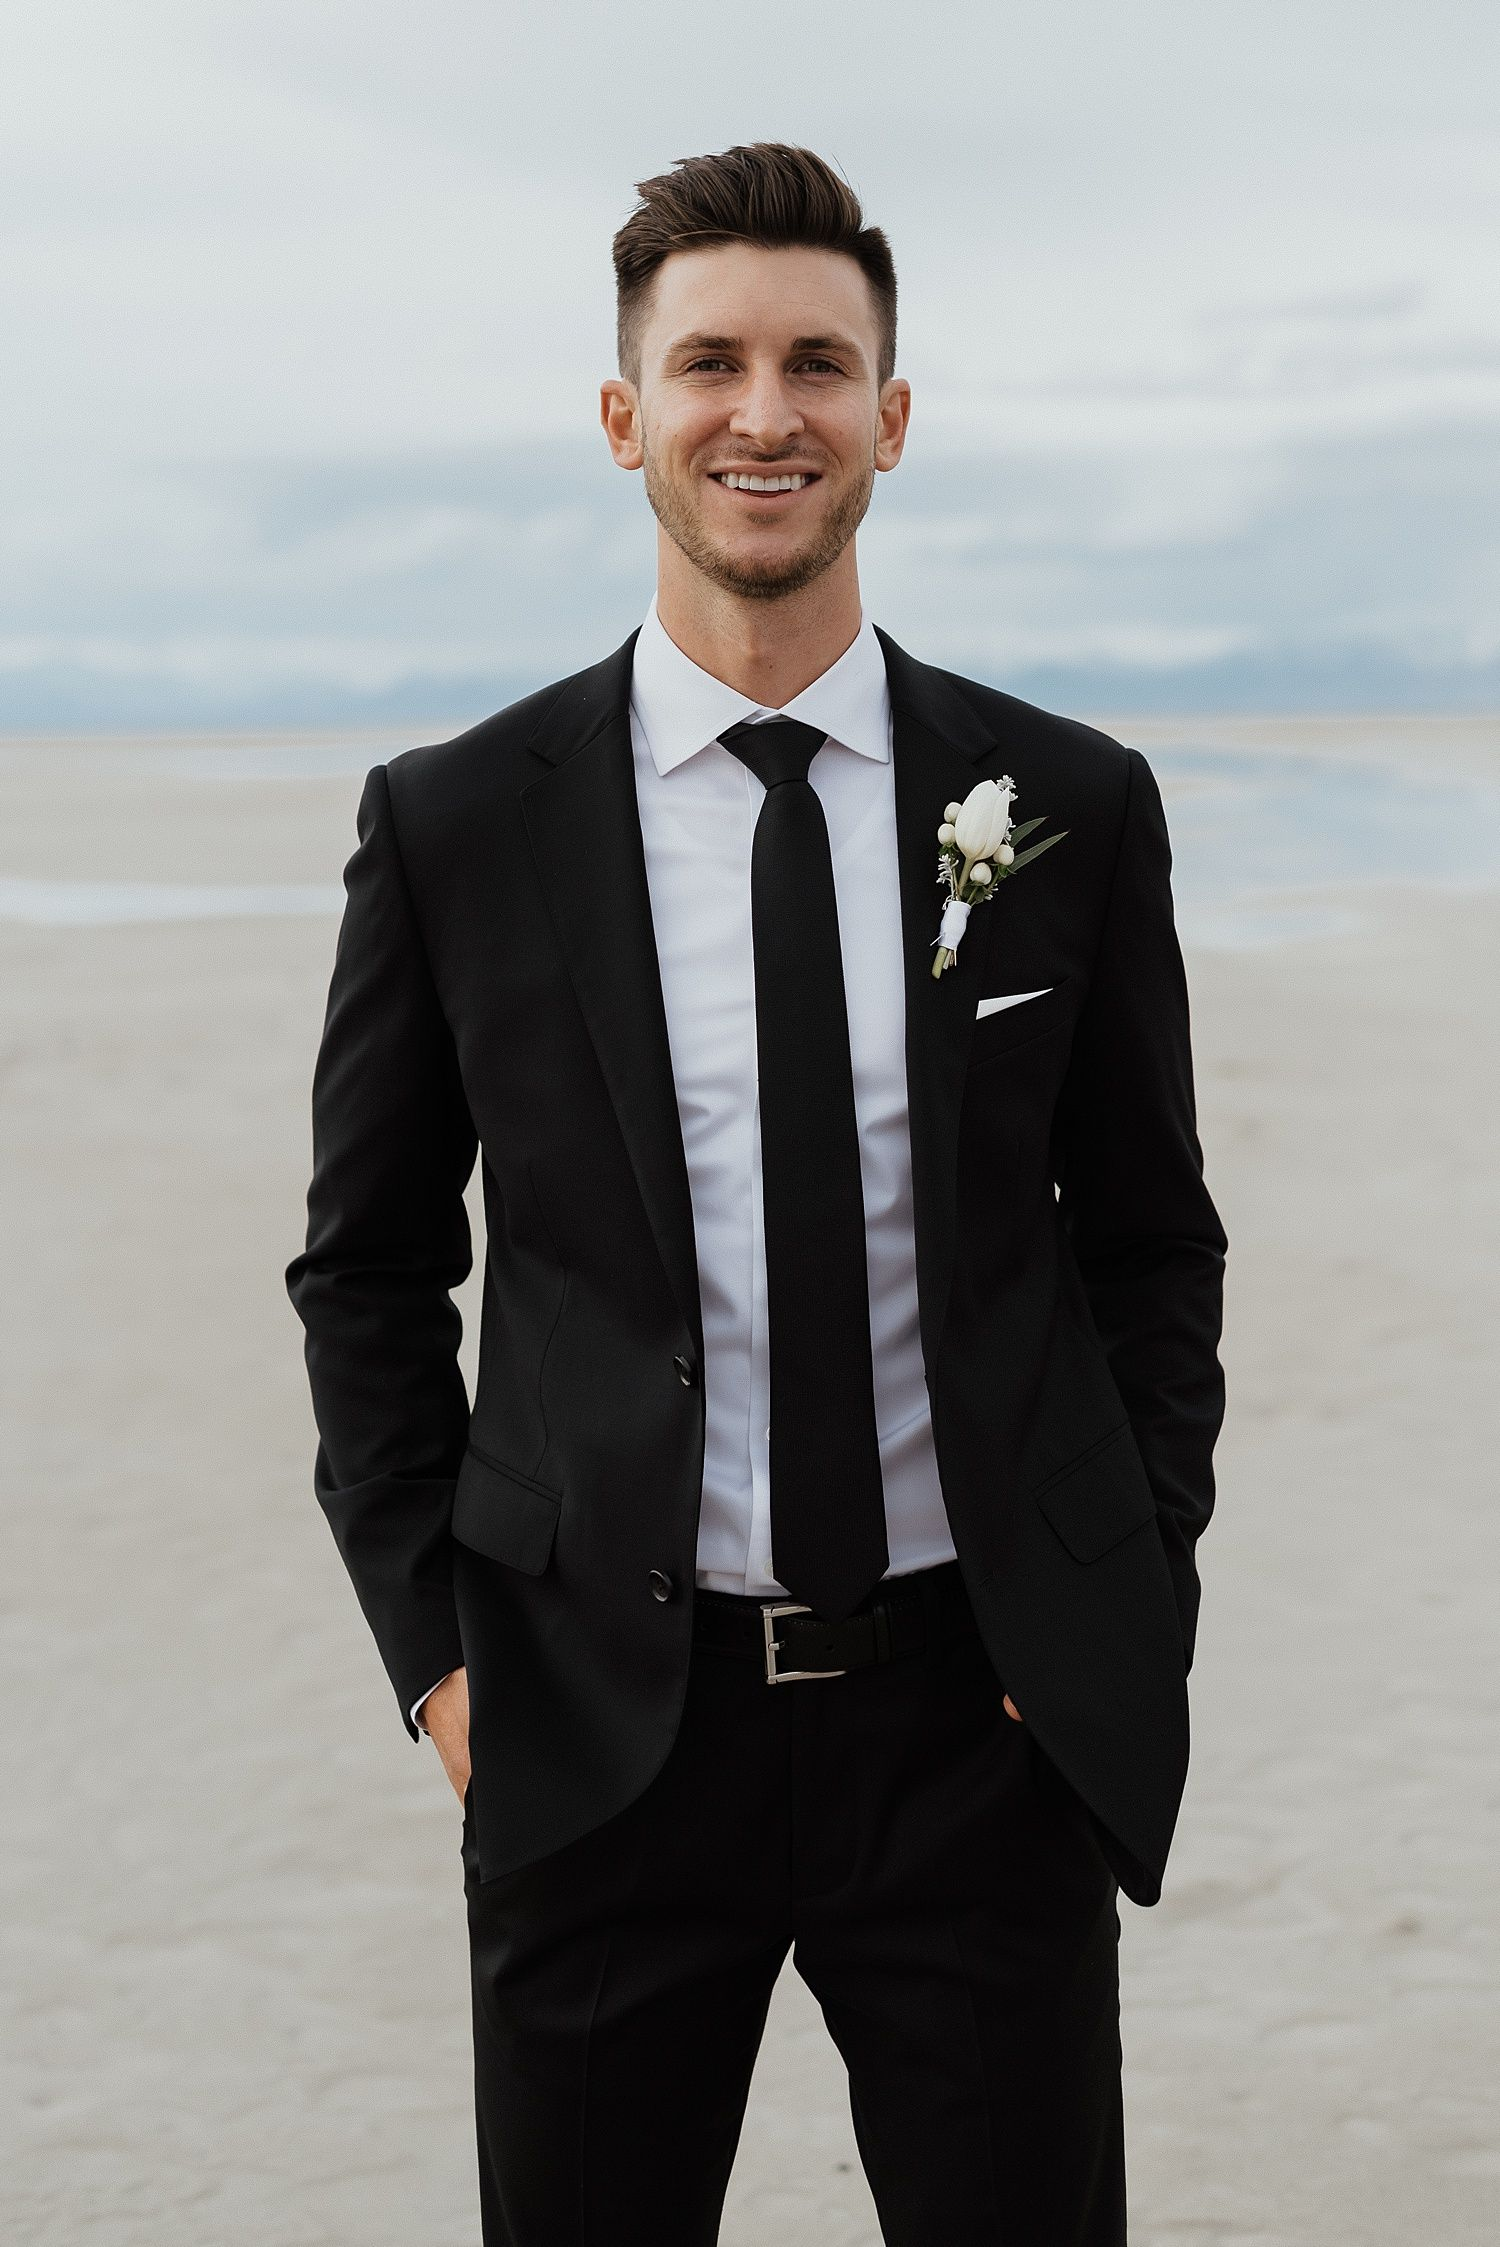 Taylor And Taylor Great Salt Lake First Look Bridals Zandra Barriga Photo Groom Suit Black Black Suit Wedding Black Suit Men